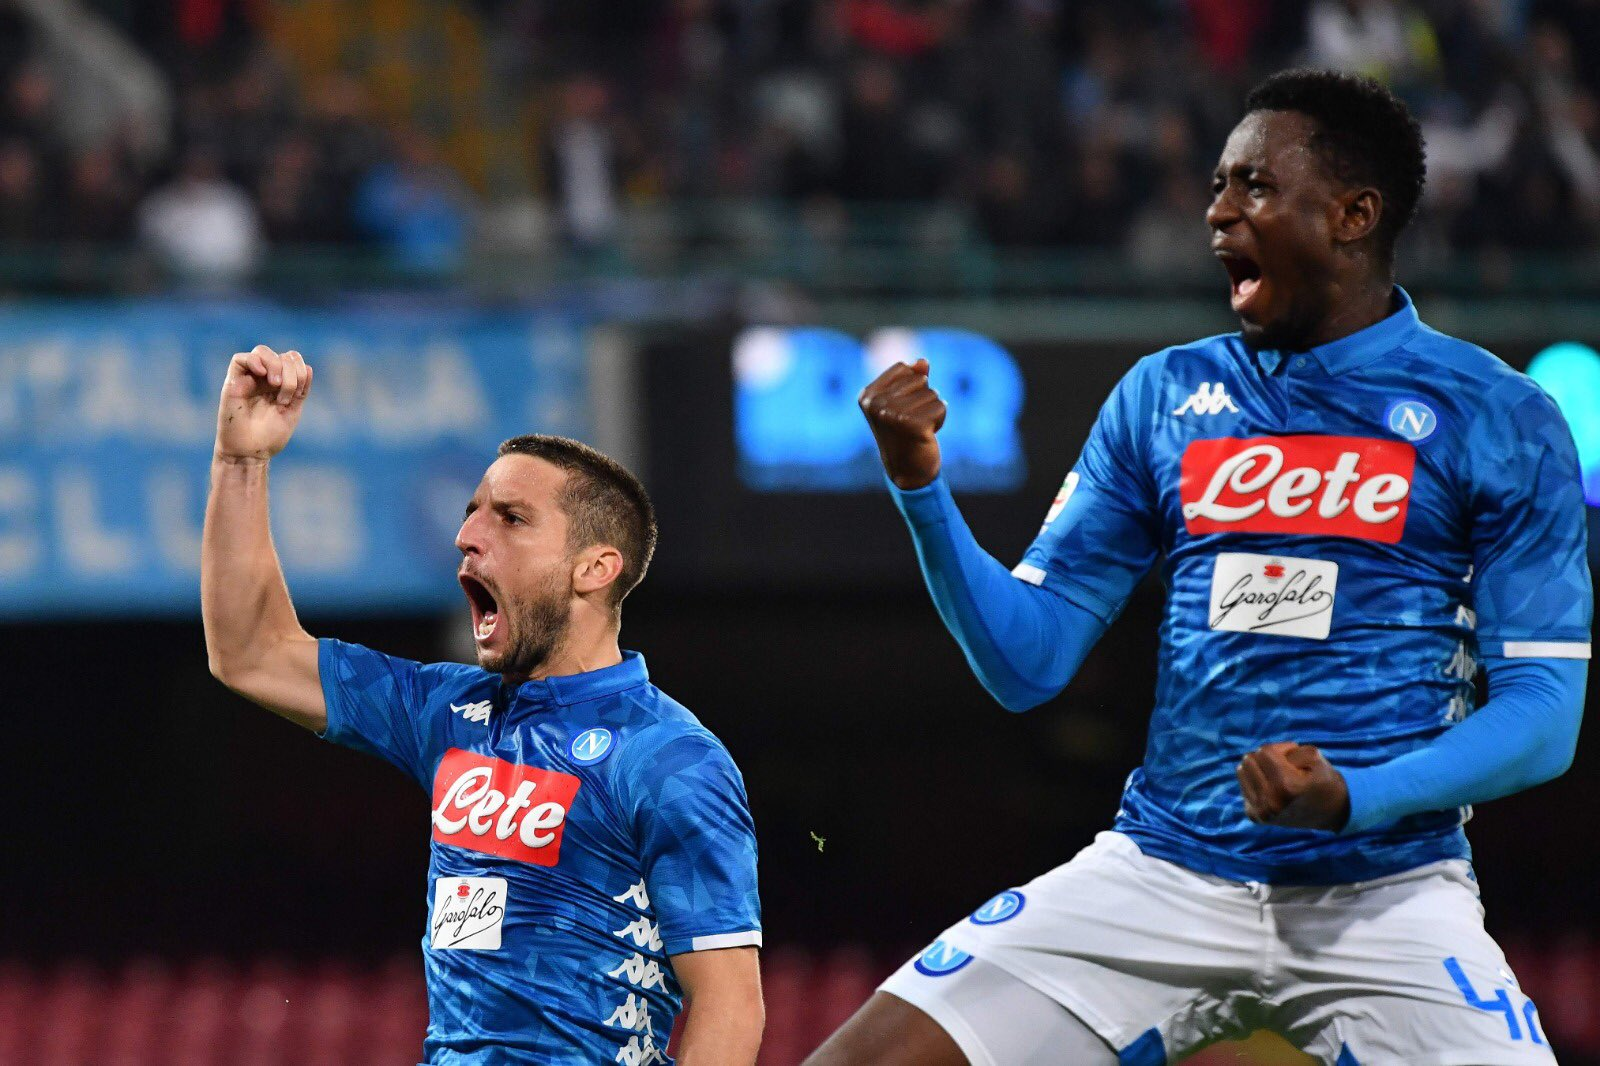 Napoli-Empoli, la cronaca - Gol del Napoli